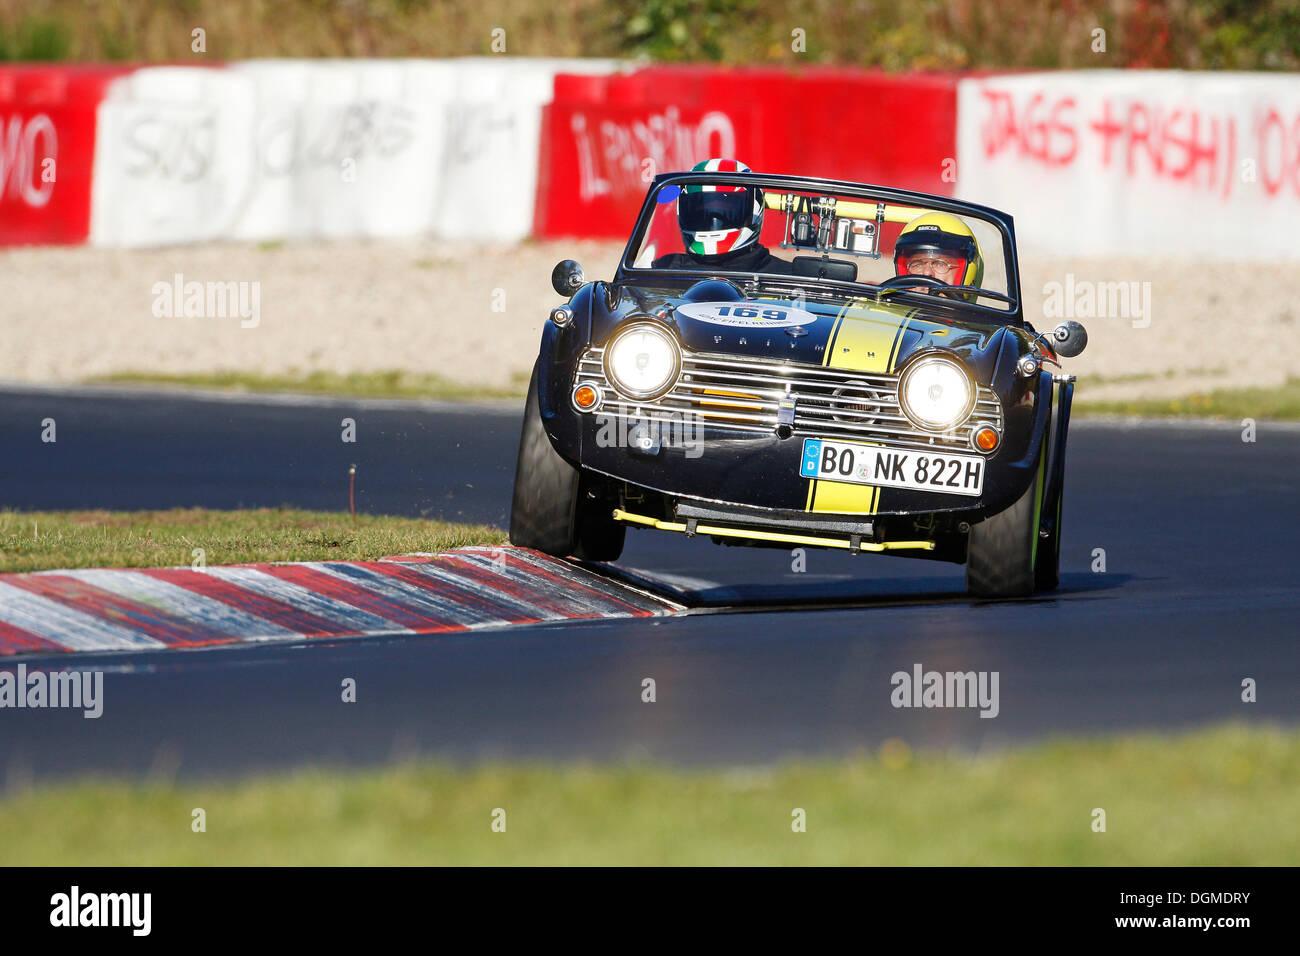 Triumph TR 4 A, Eifelrennen 2008 race, Nordschleife, Nurburgring race track, Rhineland-Palatinate - Stock Image